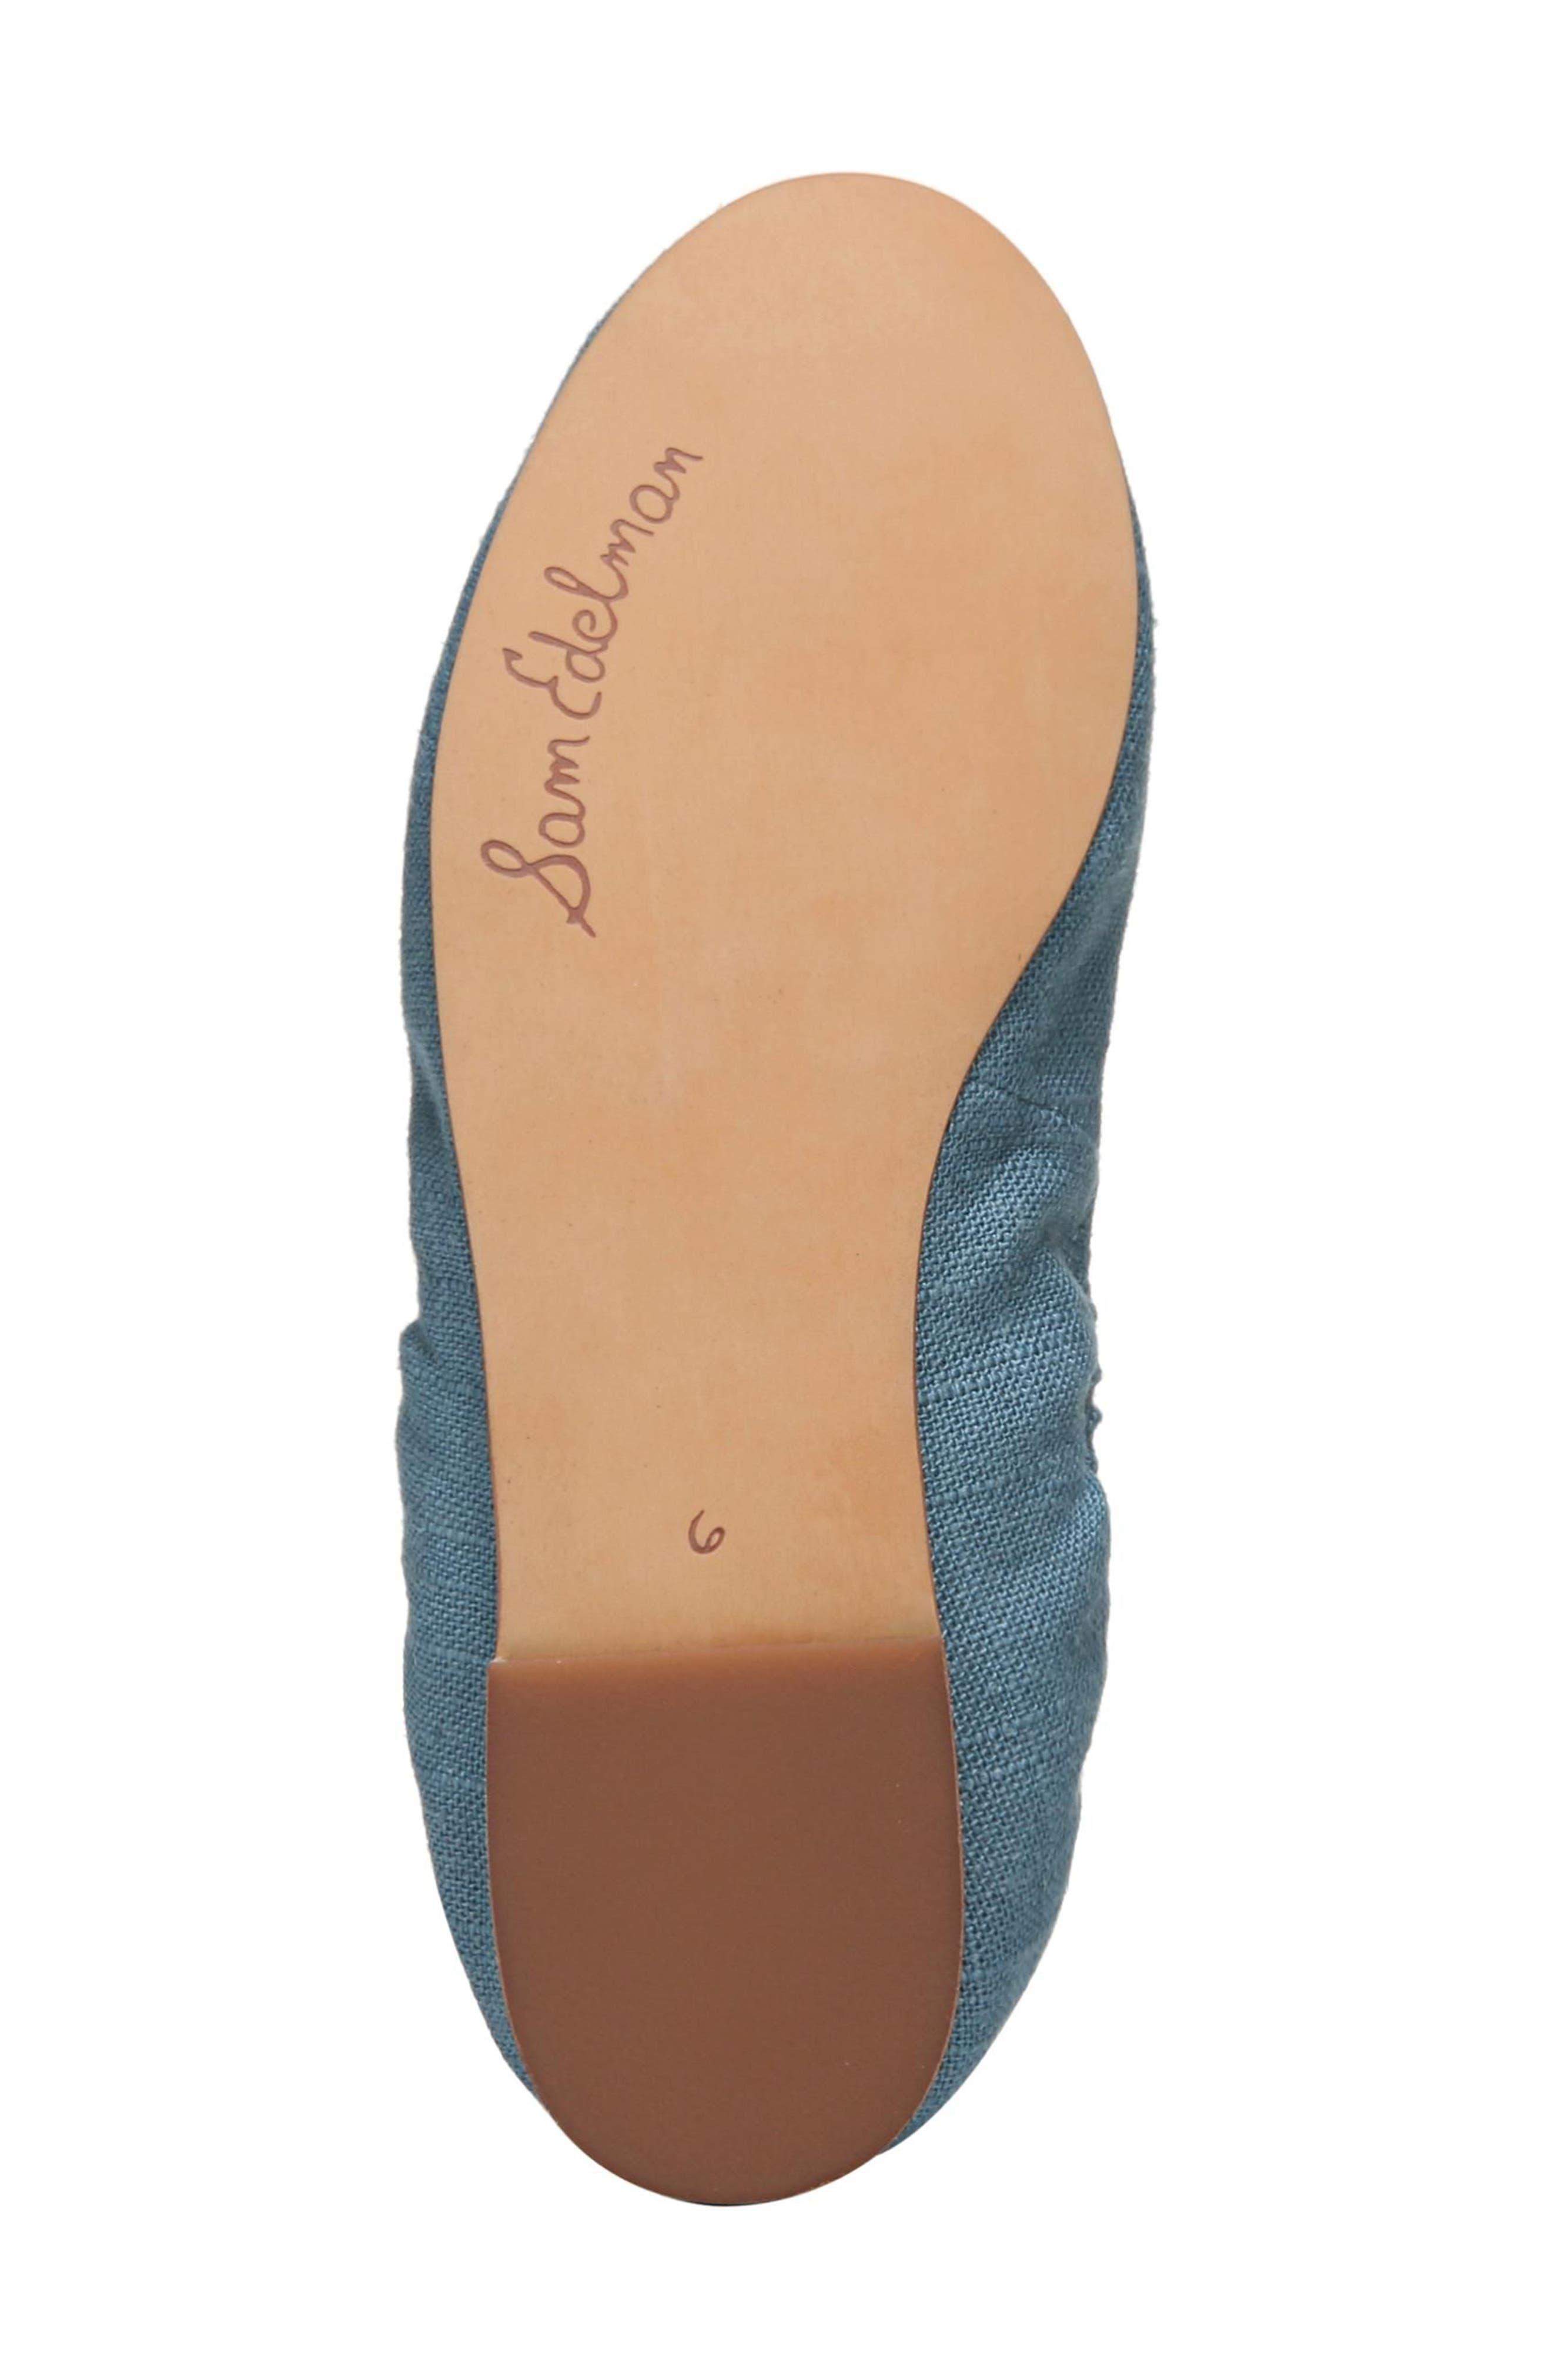 Felicia Flat,                             Alternate thumbnail 5, color,                             DENIM BLUE FABRIC